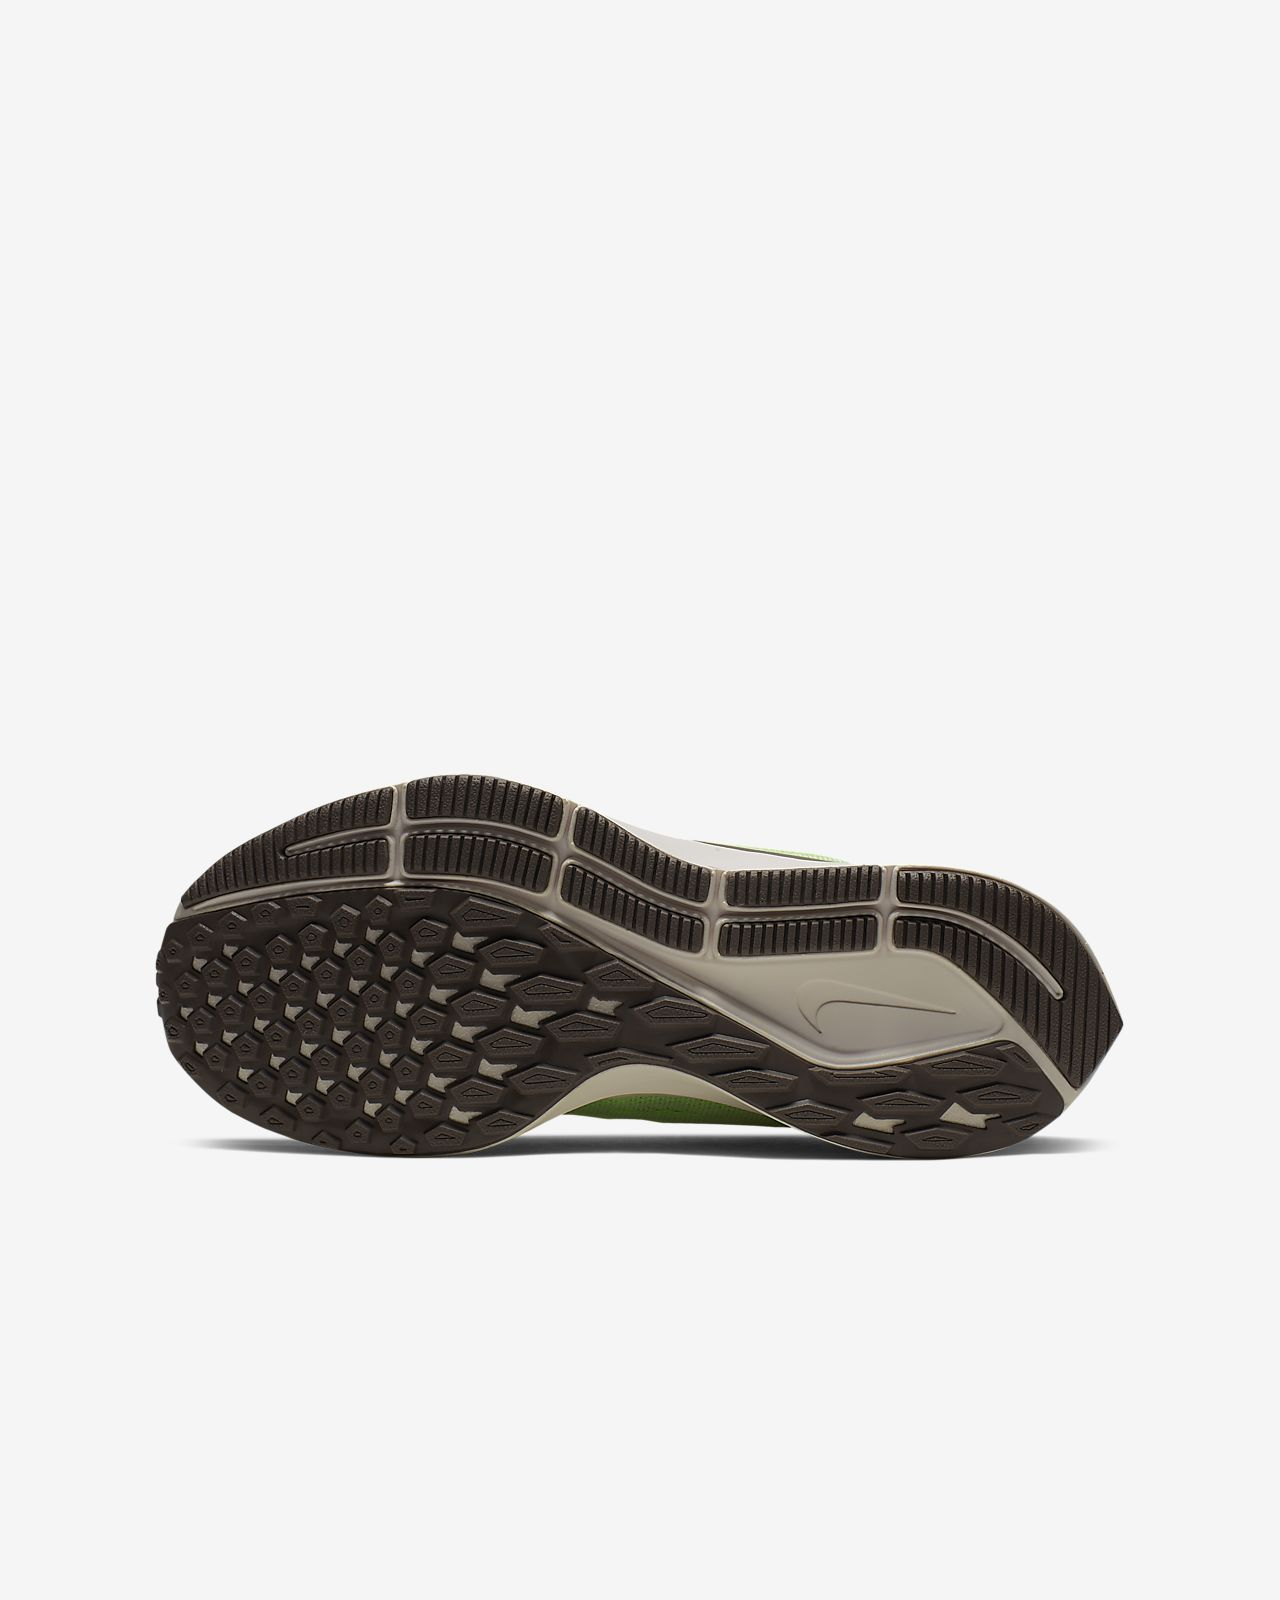 203e6f571 Nike Air Zoom Pegasus 36 Little/Big Kids' Running Shoe. Nike.com